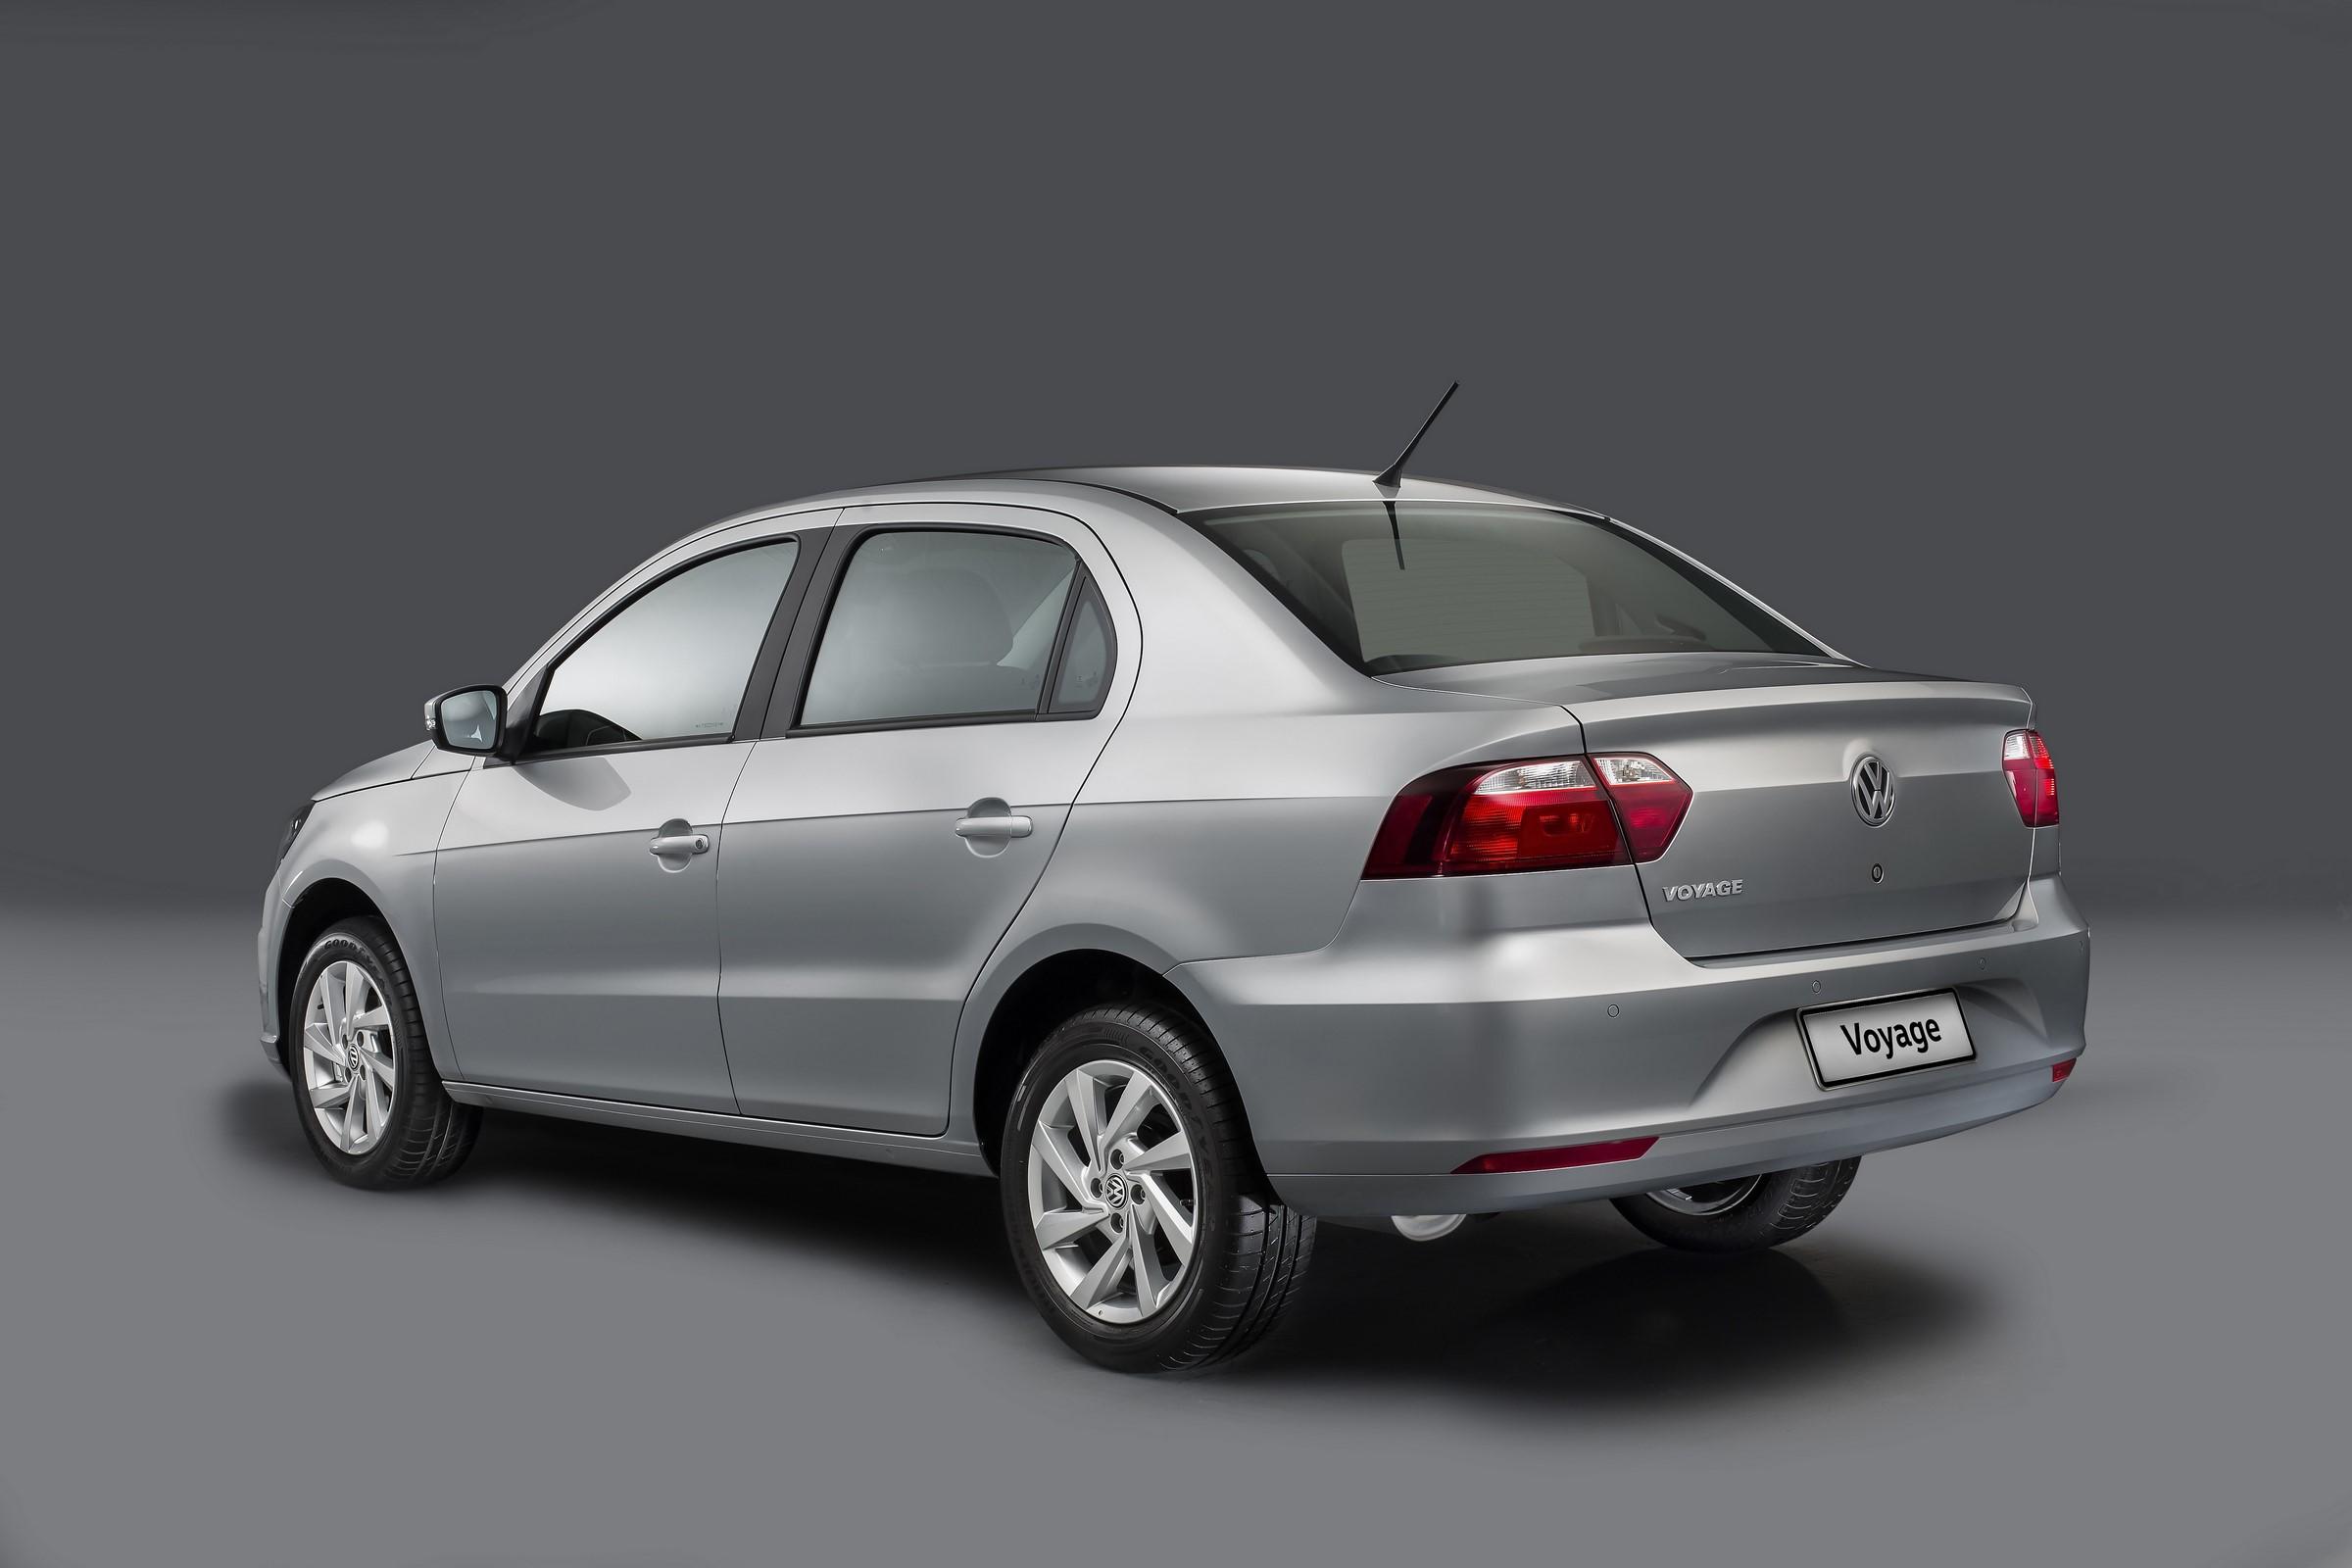 Recall da Volkswagen convoca 4 carros por problema no motor